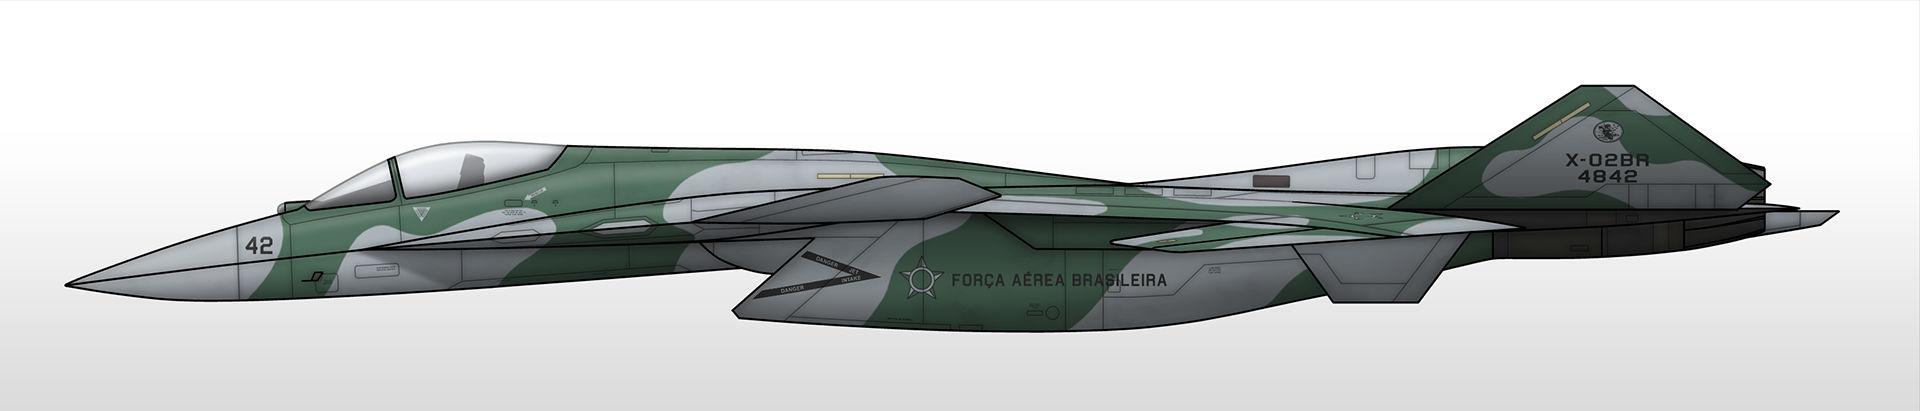 X-02BR - Brazilian Air Force